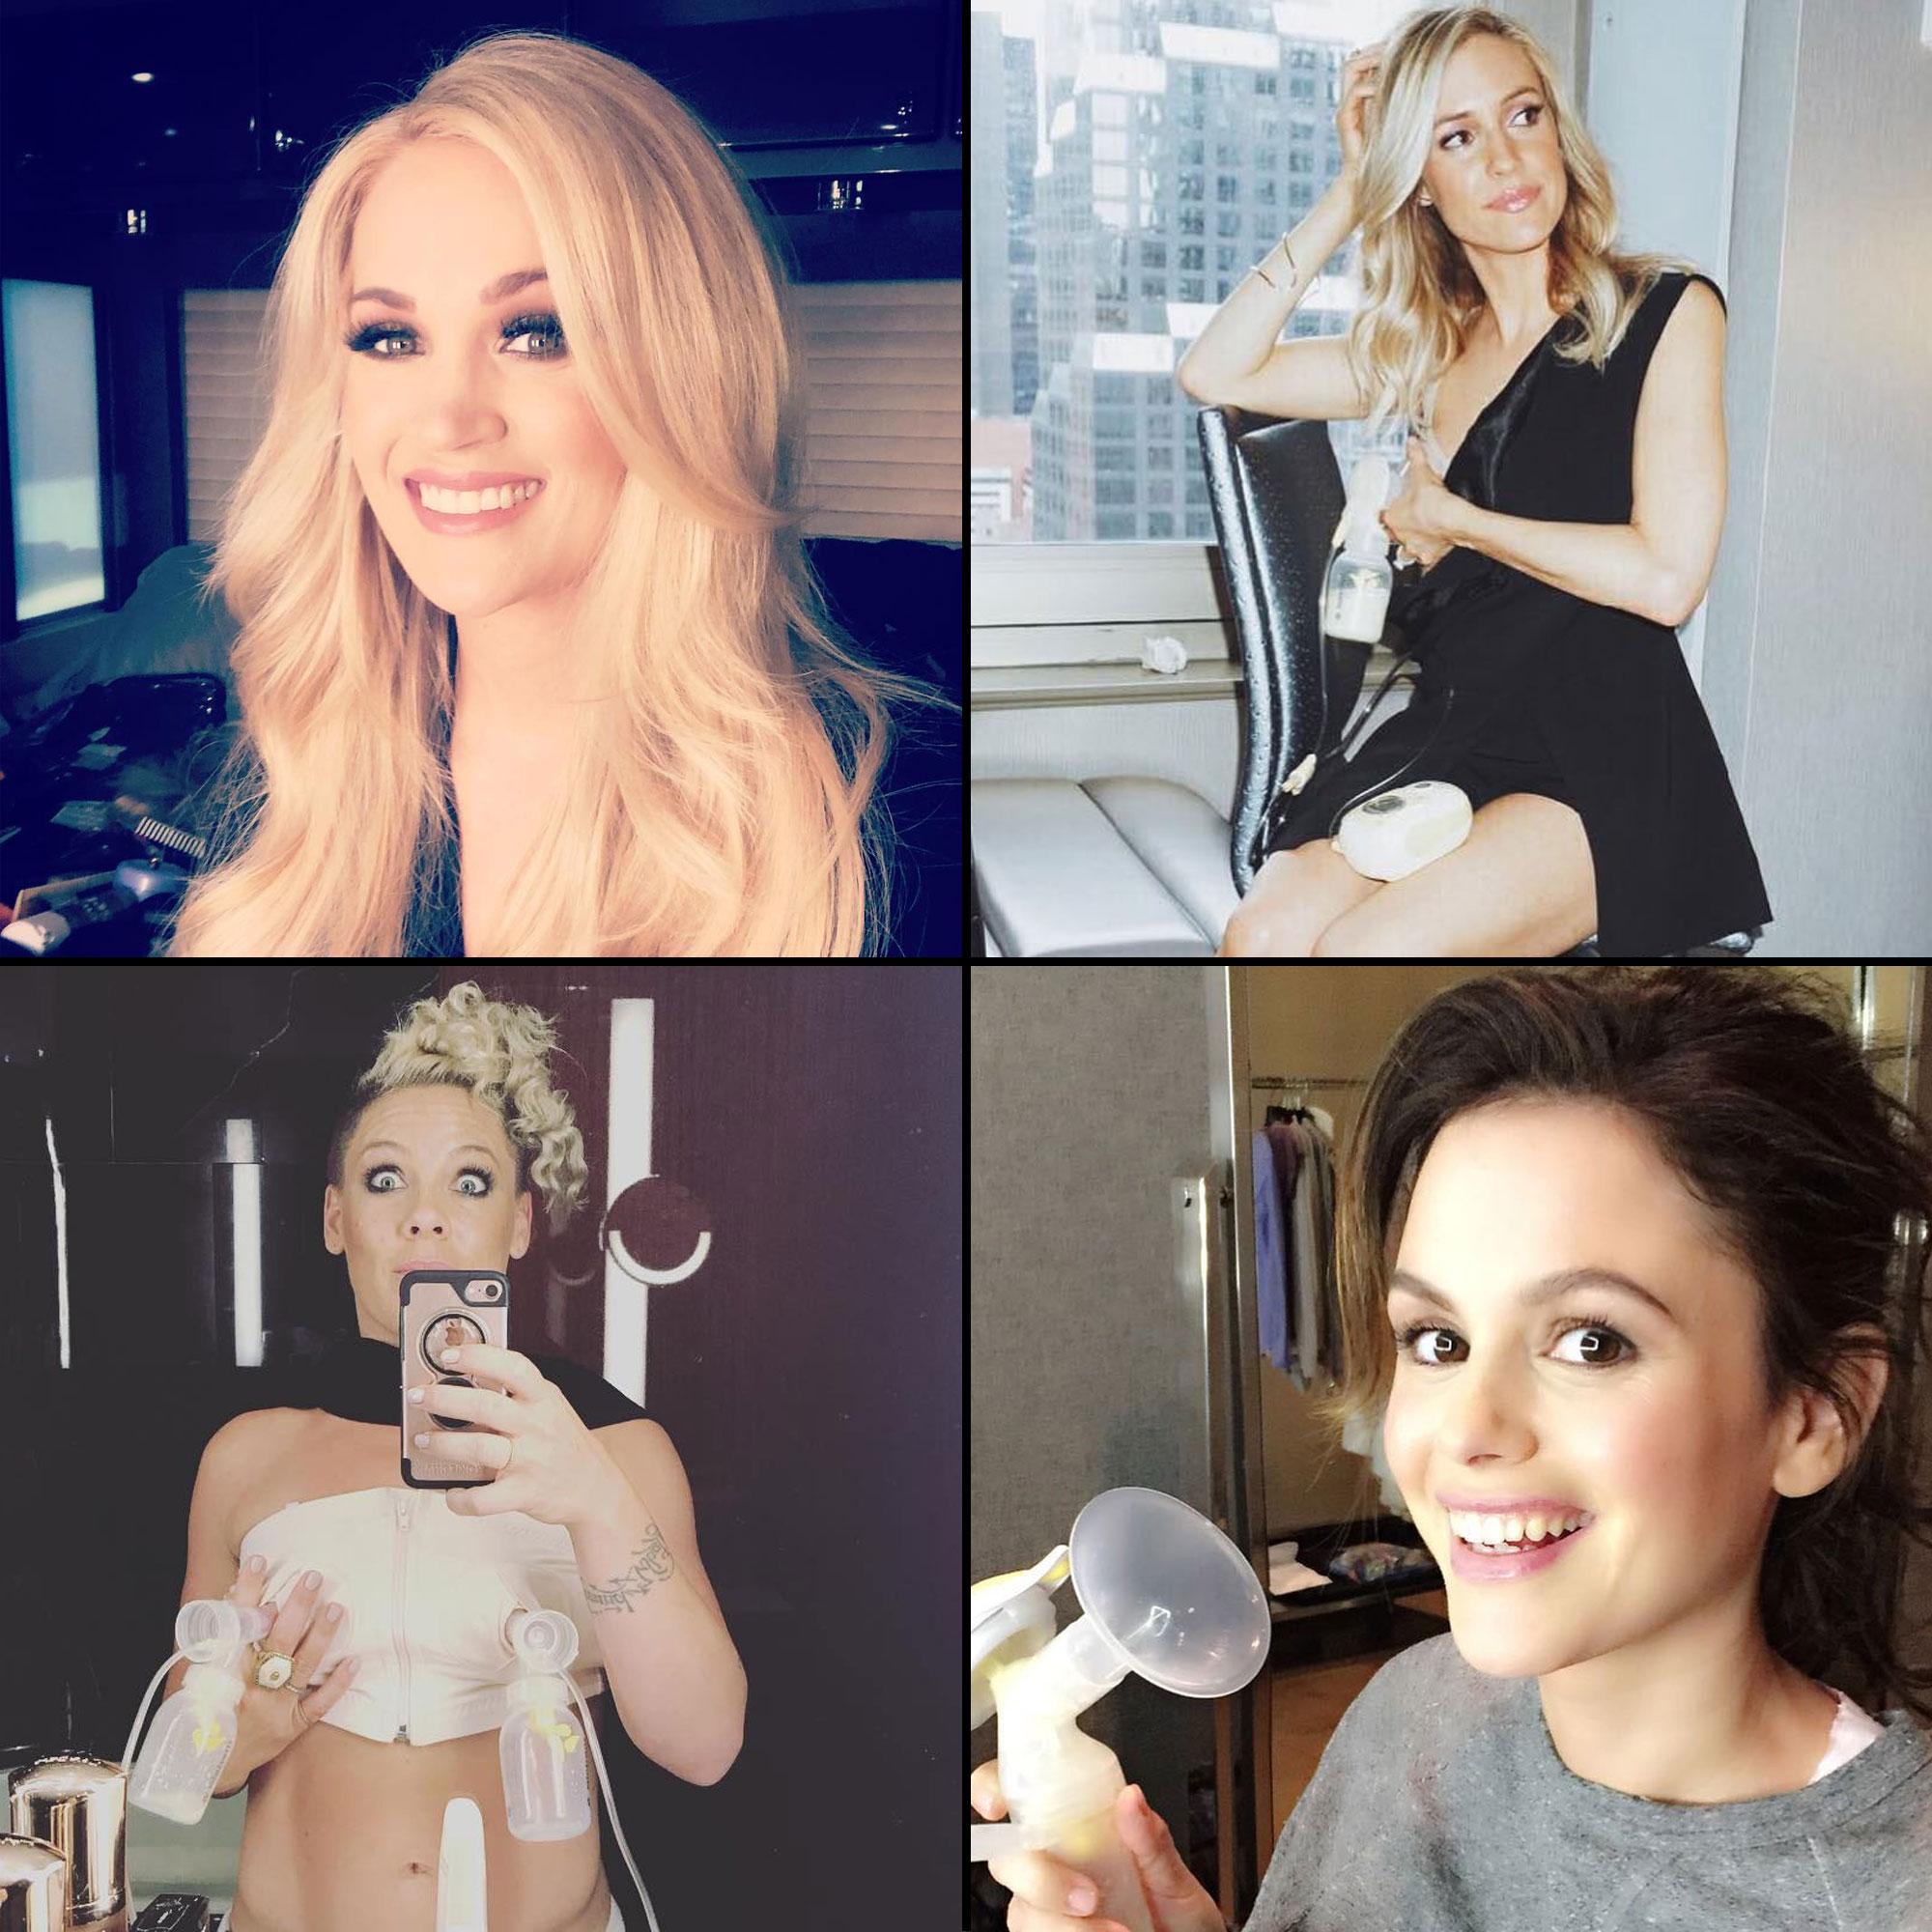 Hot female celebrities with big boobs Rachel Bilson More Celebrity Moms Pumping Breast Milk Photos